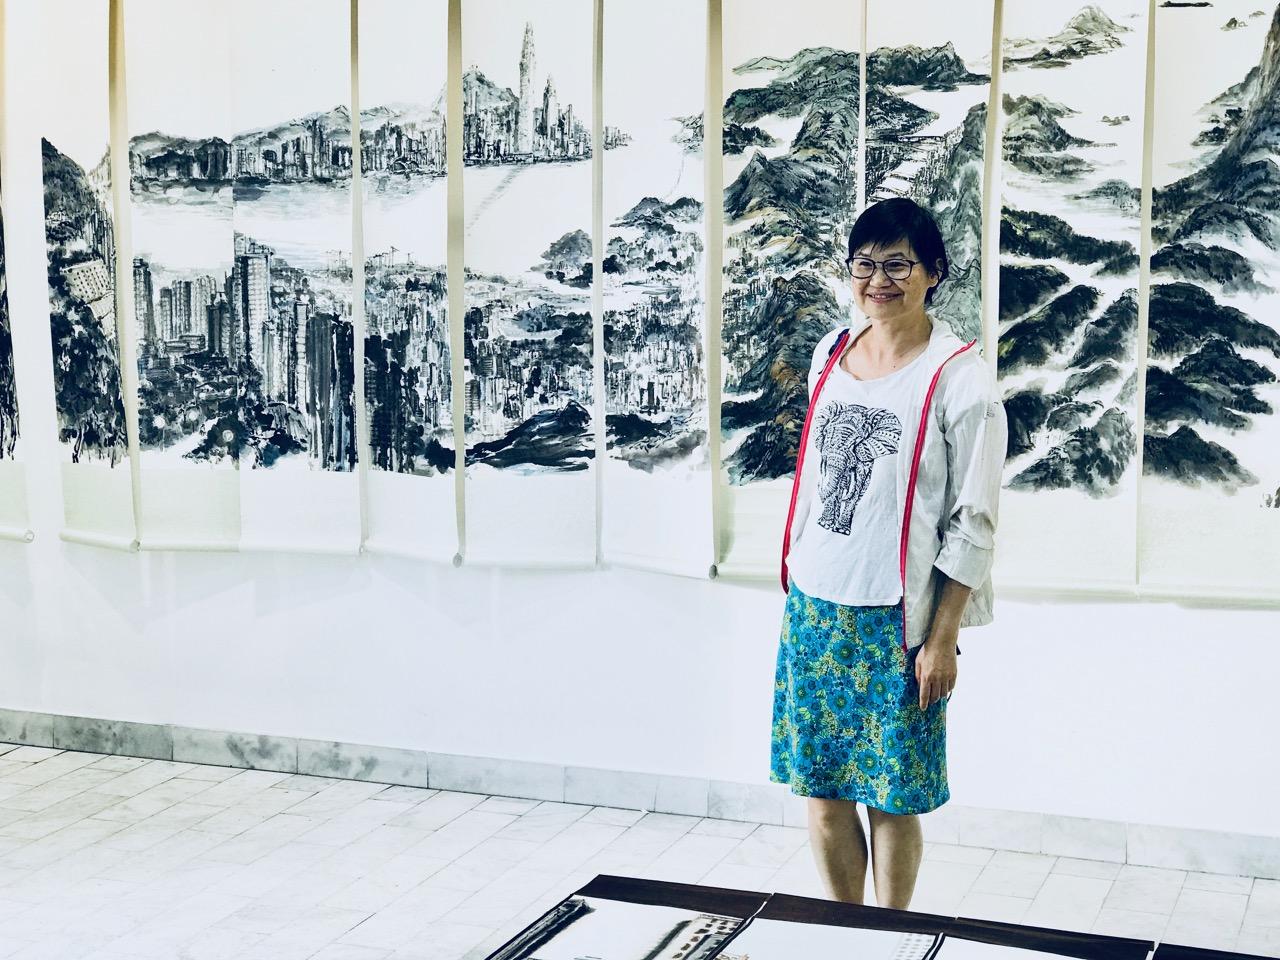 Photo of Slika u poeziji  kineske umetnice Đo In Fan u galeriji u Pirotu